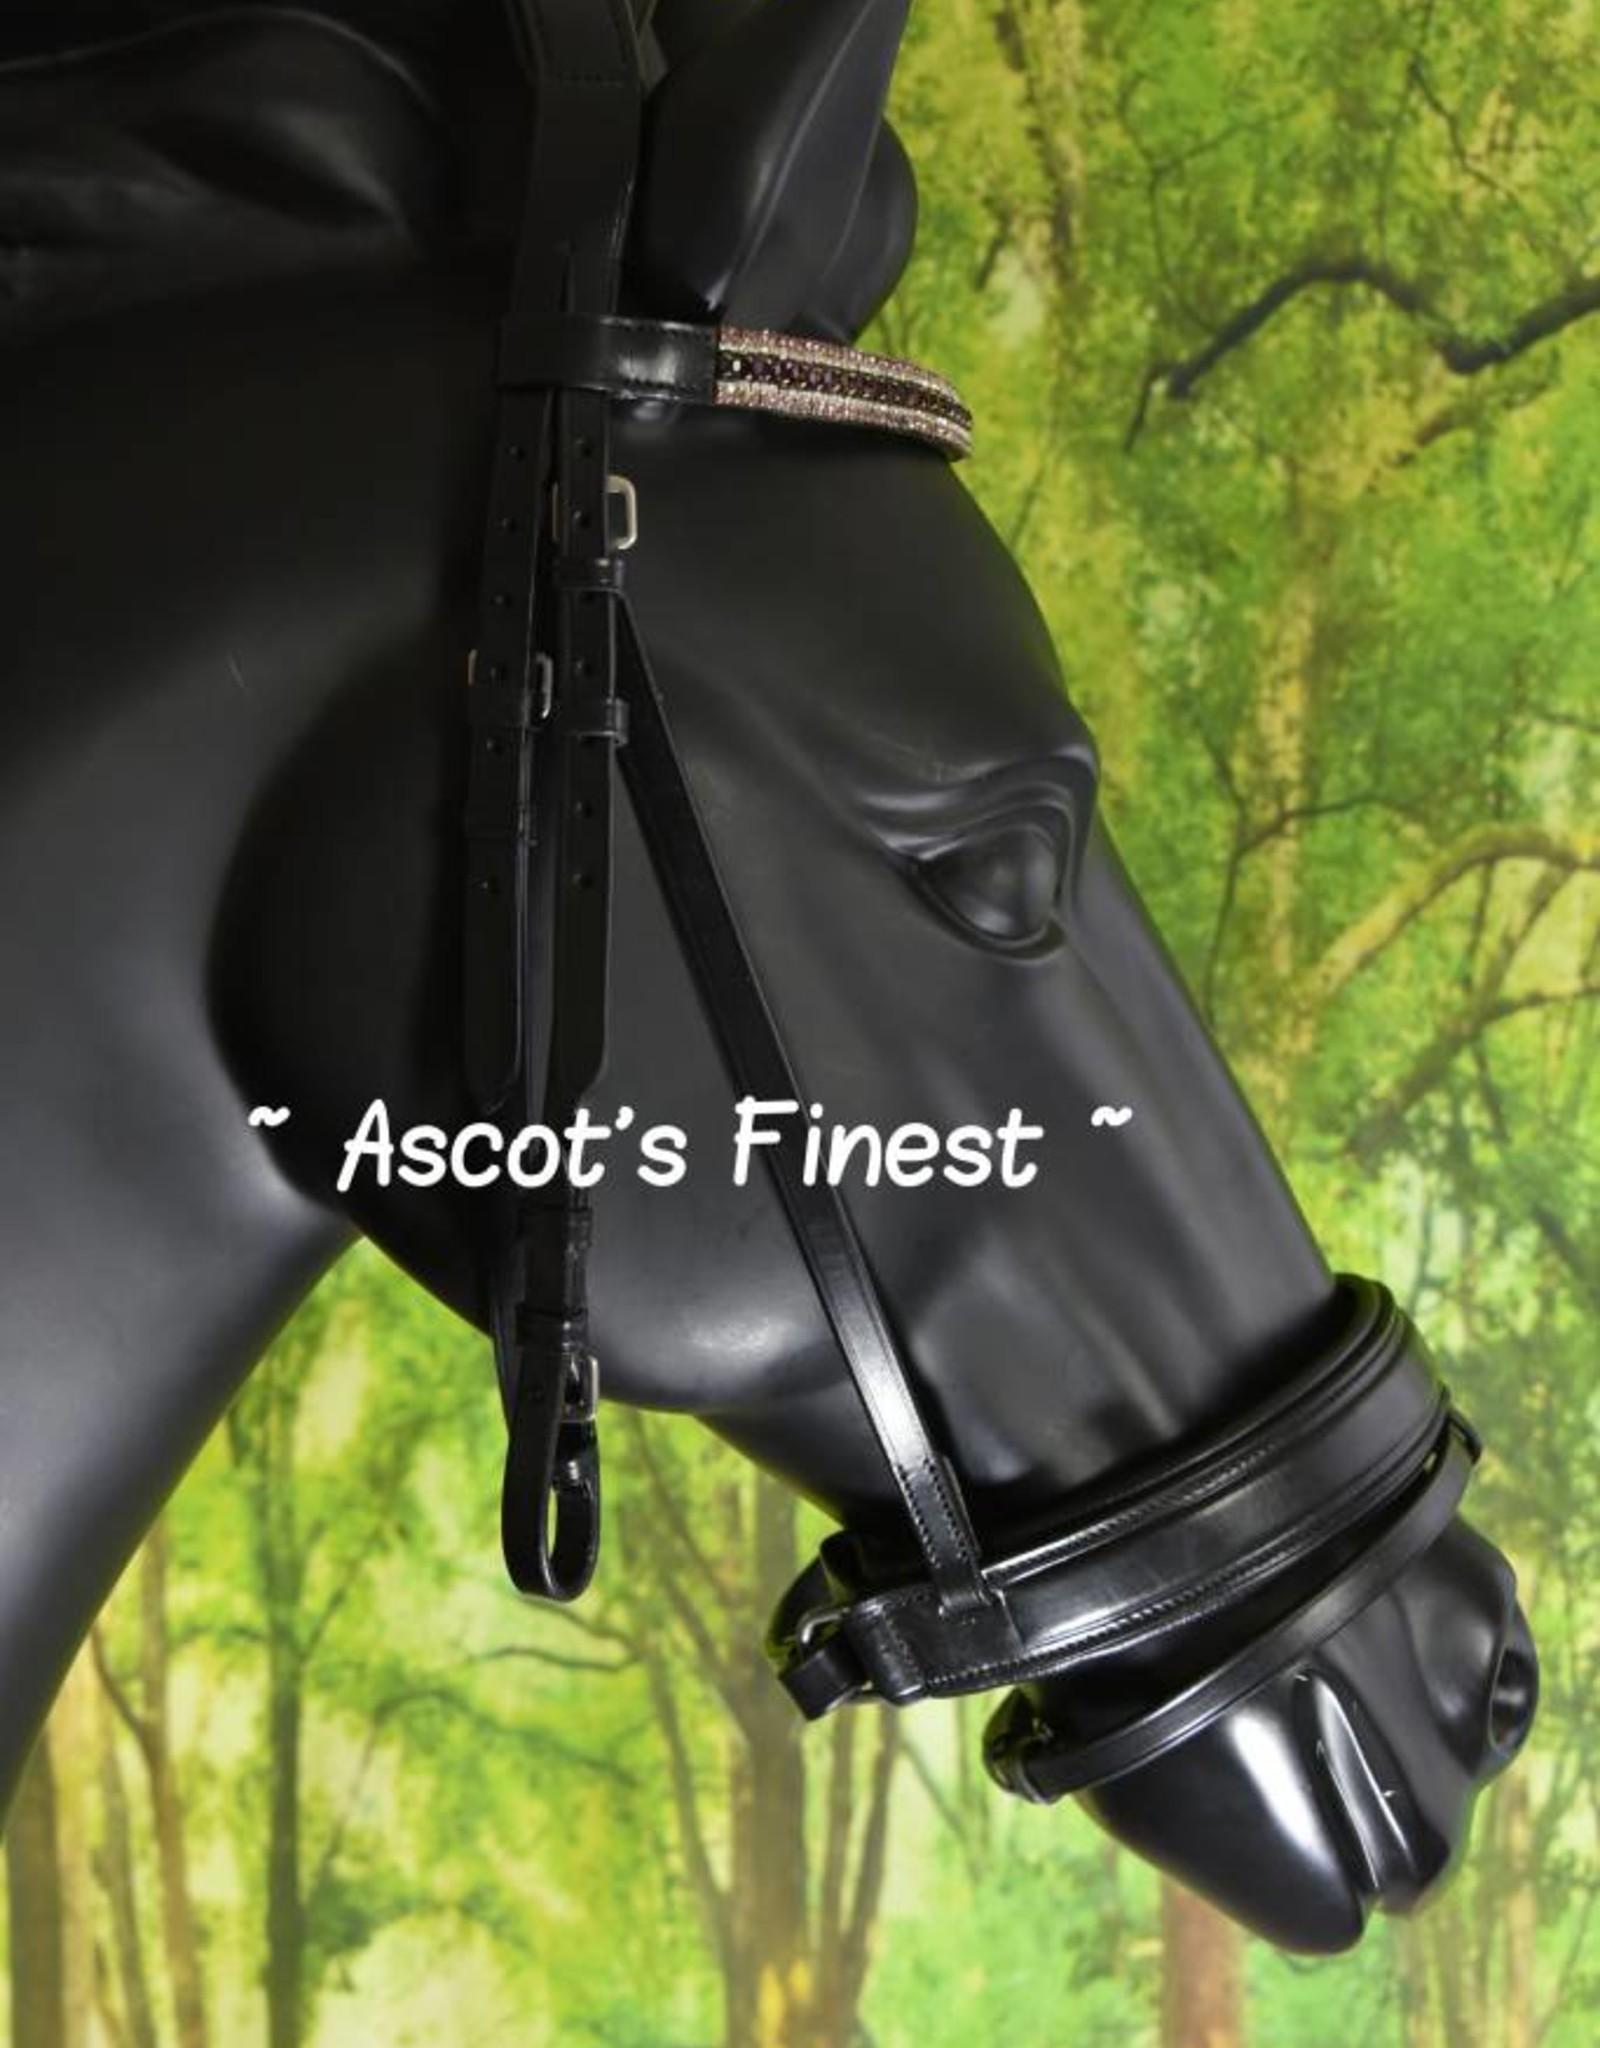 Ascot's Finest Zwart rundleer hoofdstel met brede neusriem en strass - Full, Cob, Pony, Shet